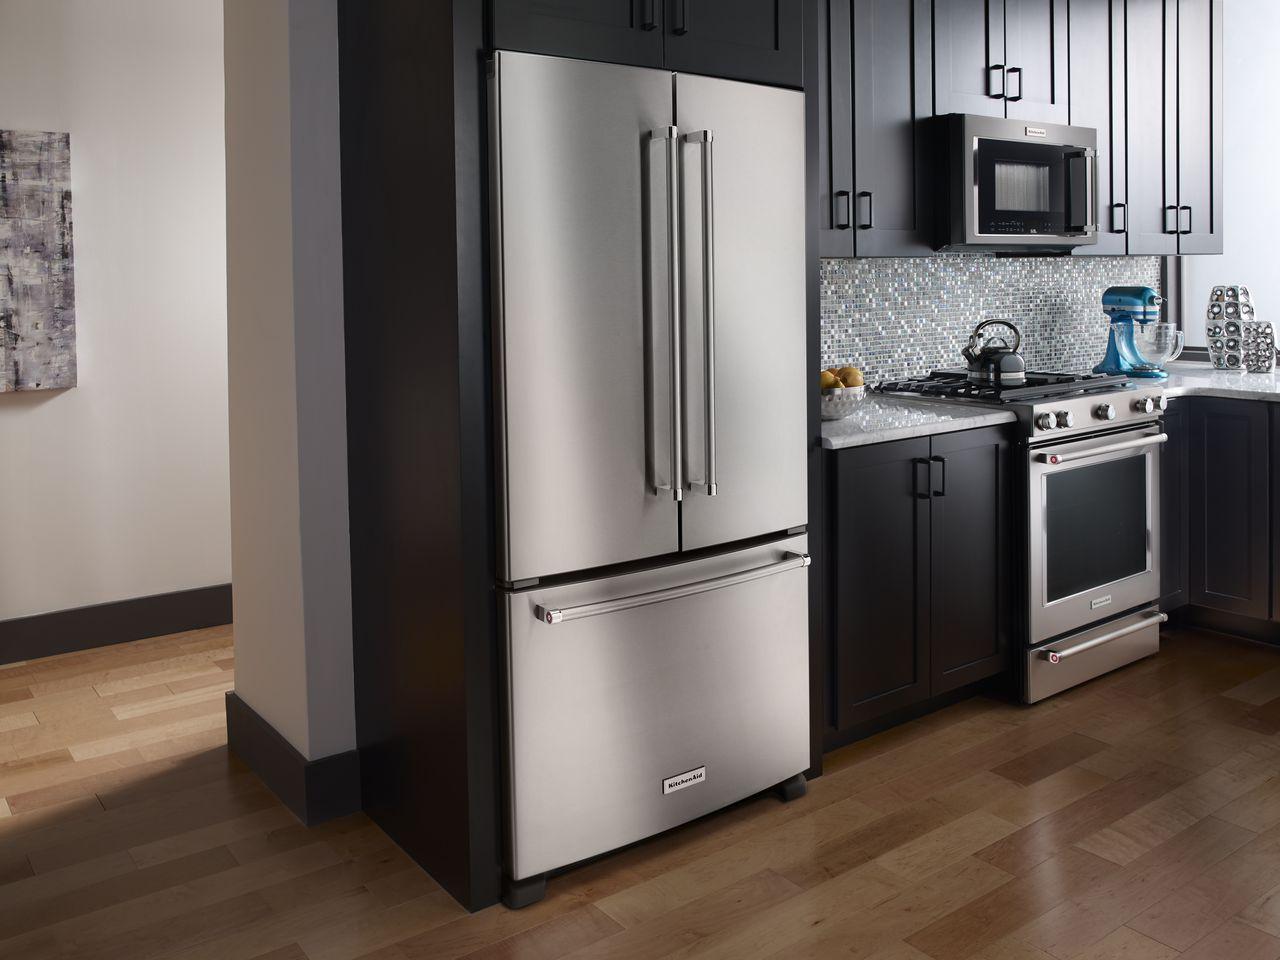 Kitchenaid cabinet depth refrigerator - Play